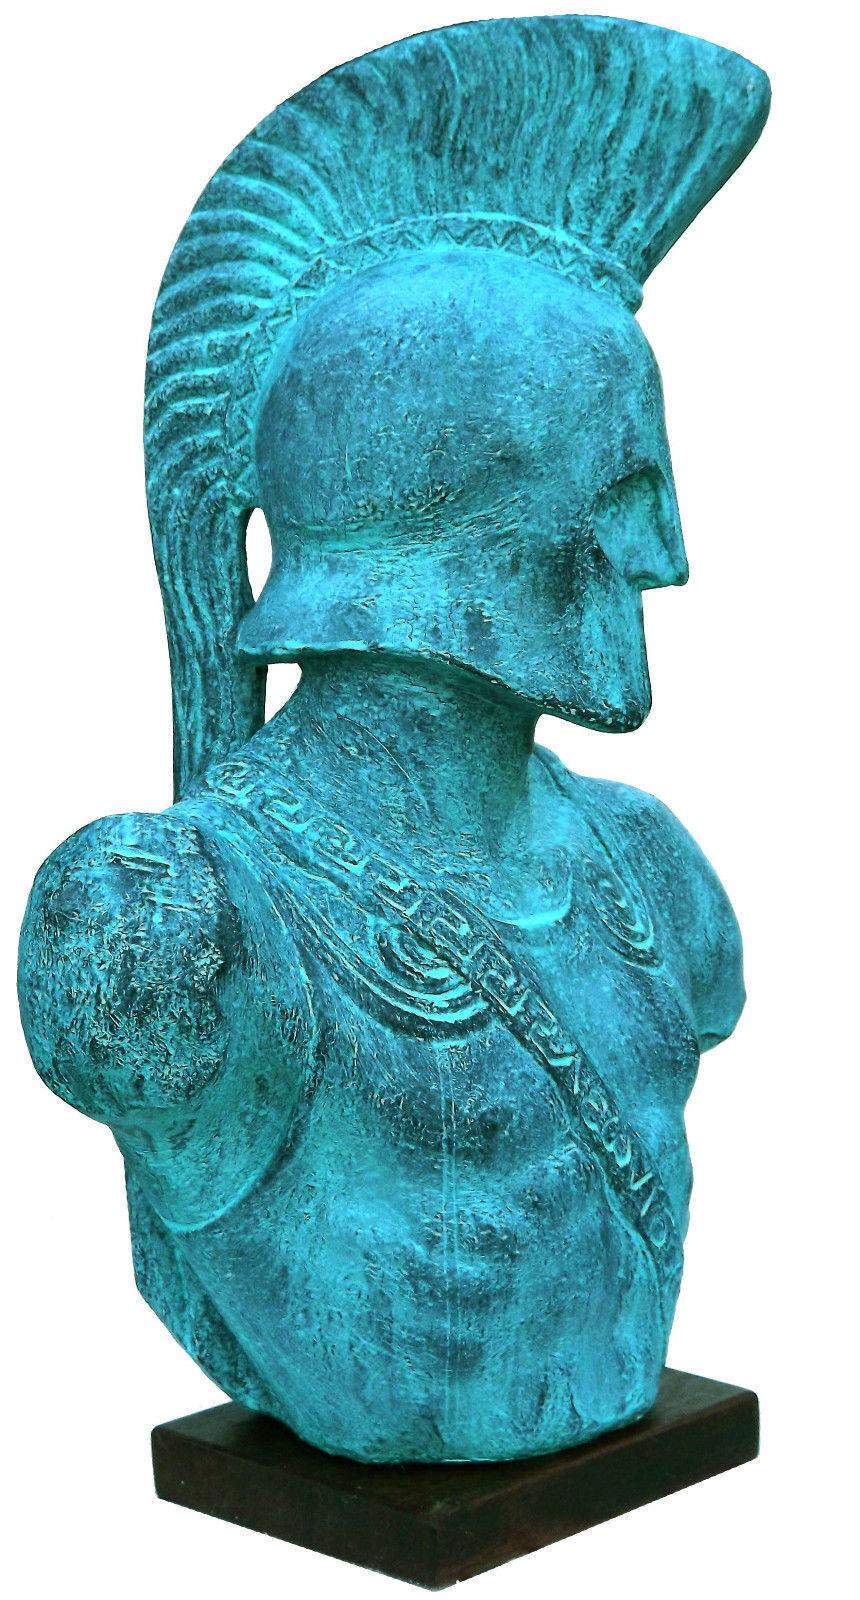 Spartan Rey Leonidas 3 d Escultura Griega Busto Estatua 38x26x13 cm pátina acabado.